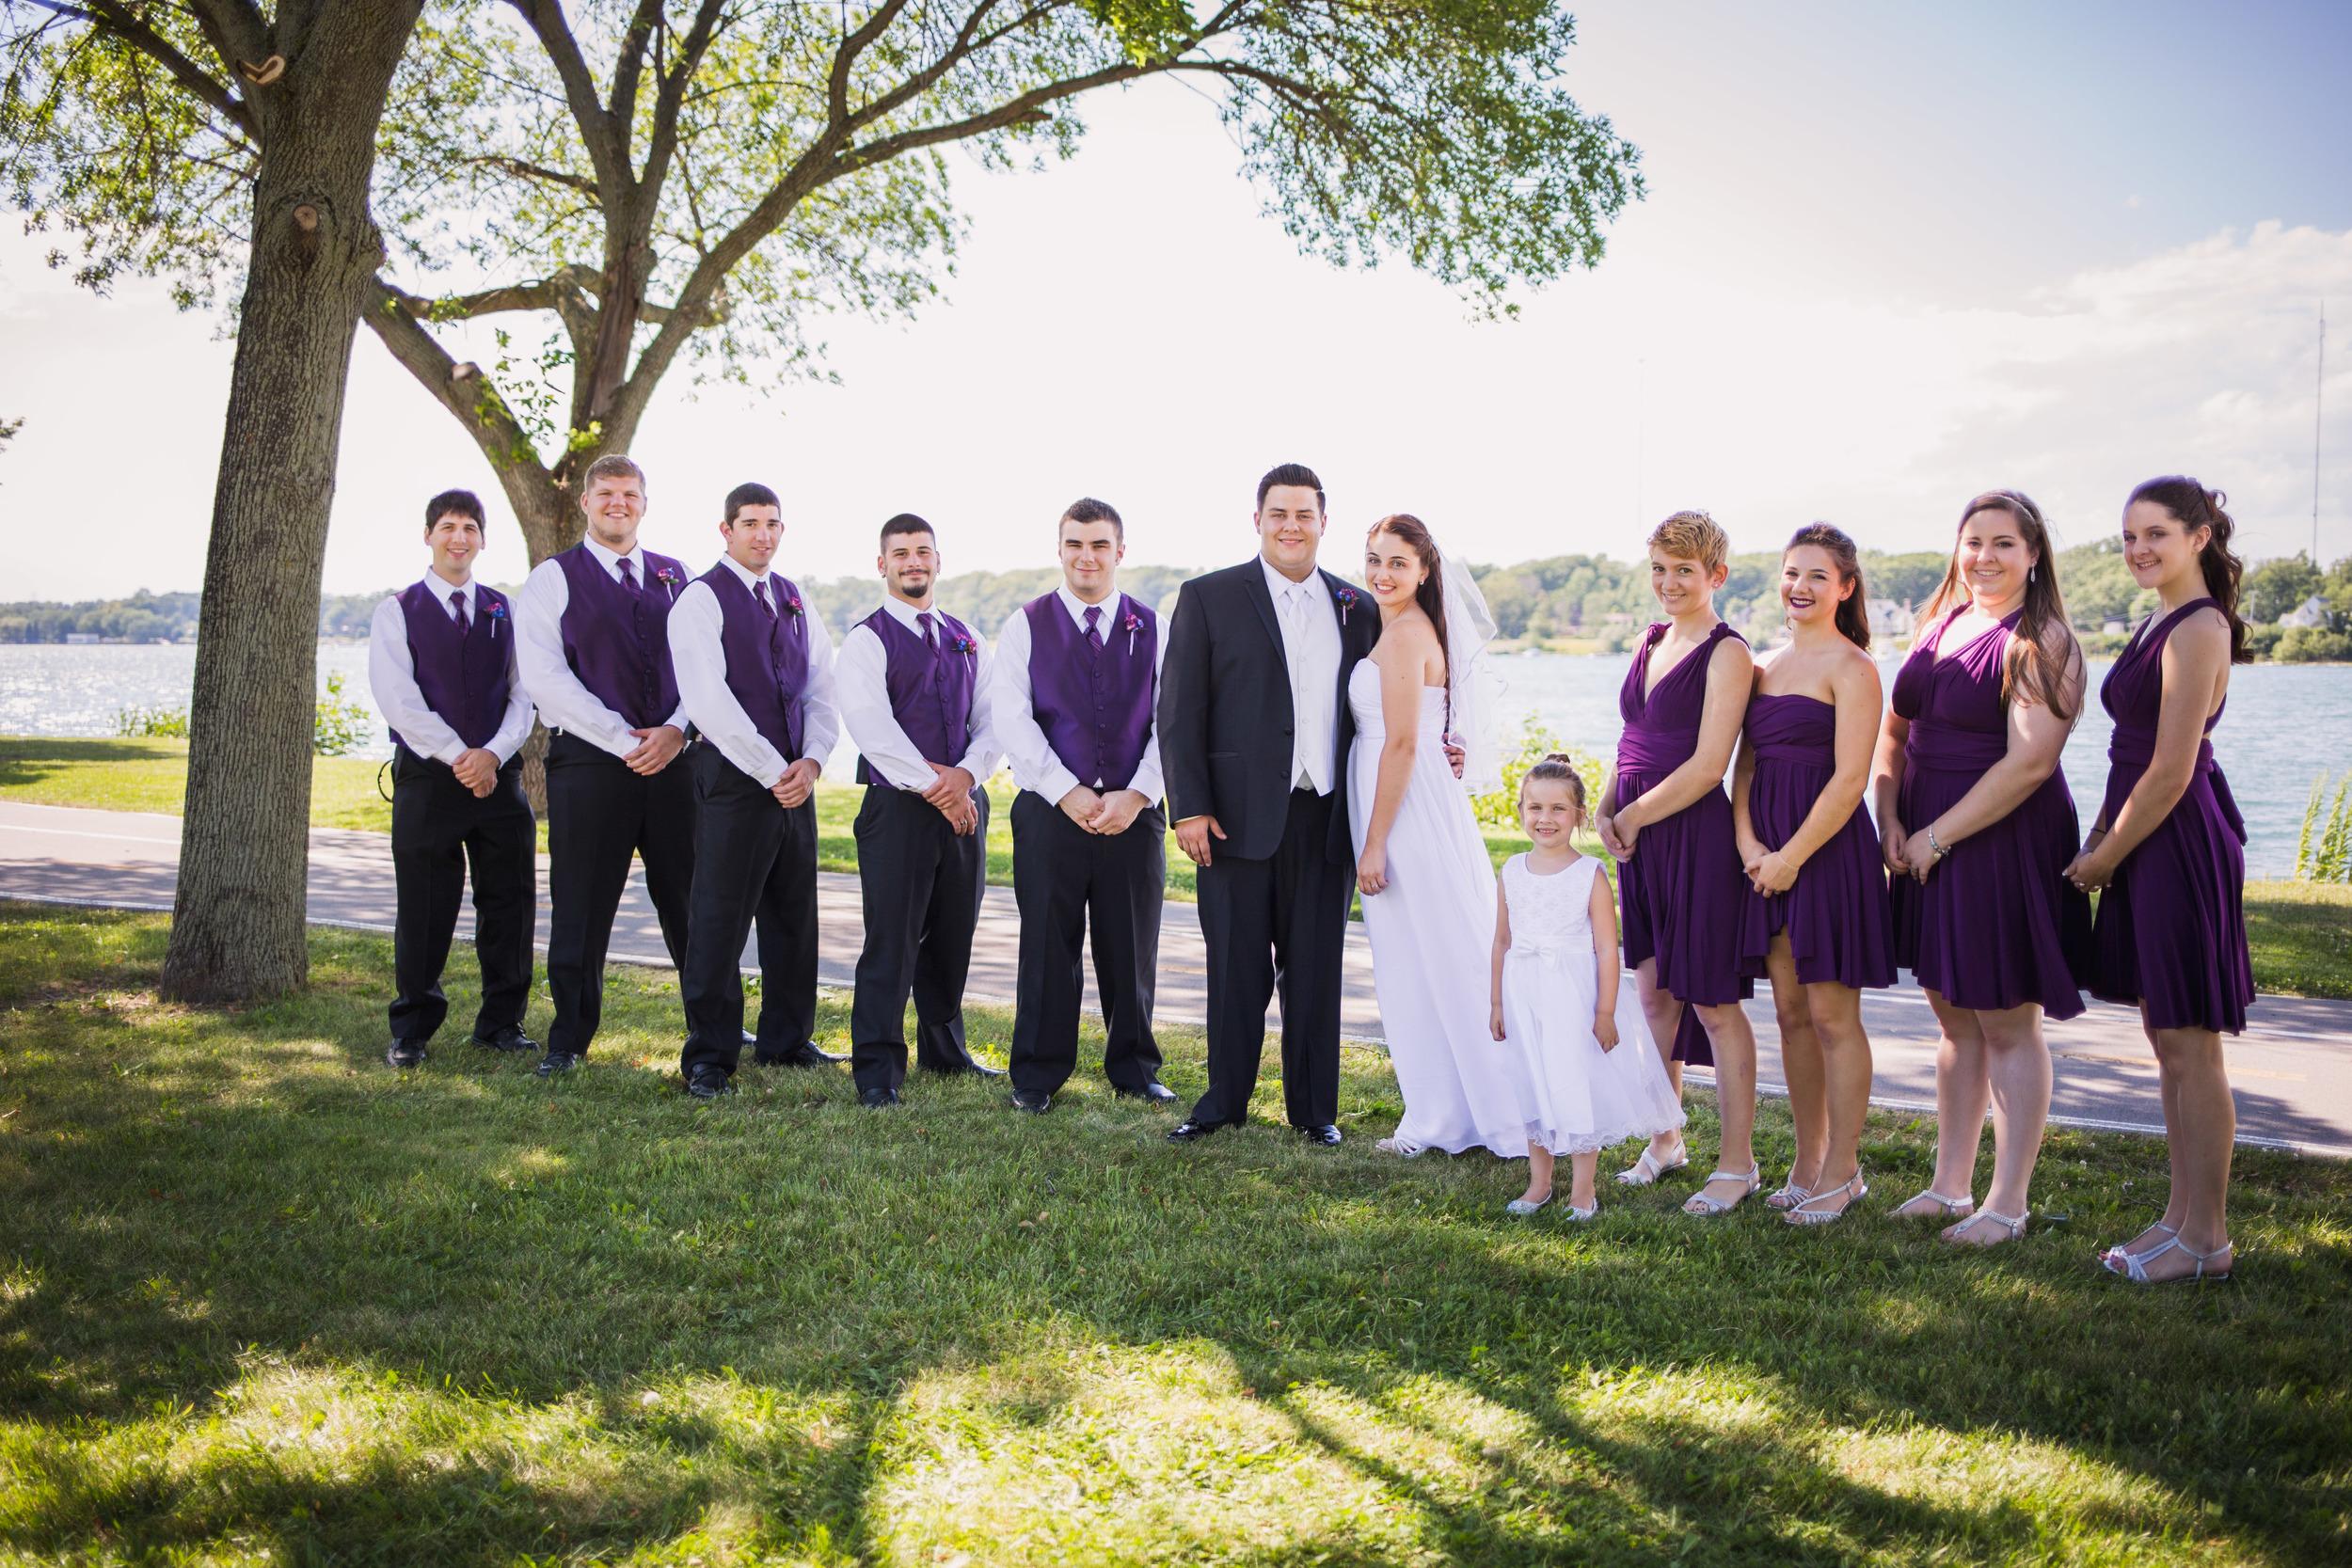 Stephanie-and-Mitchell-Buffalo-NY-Wedding-Stefan-Ludwig-Photography-13.jpg